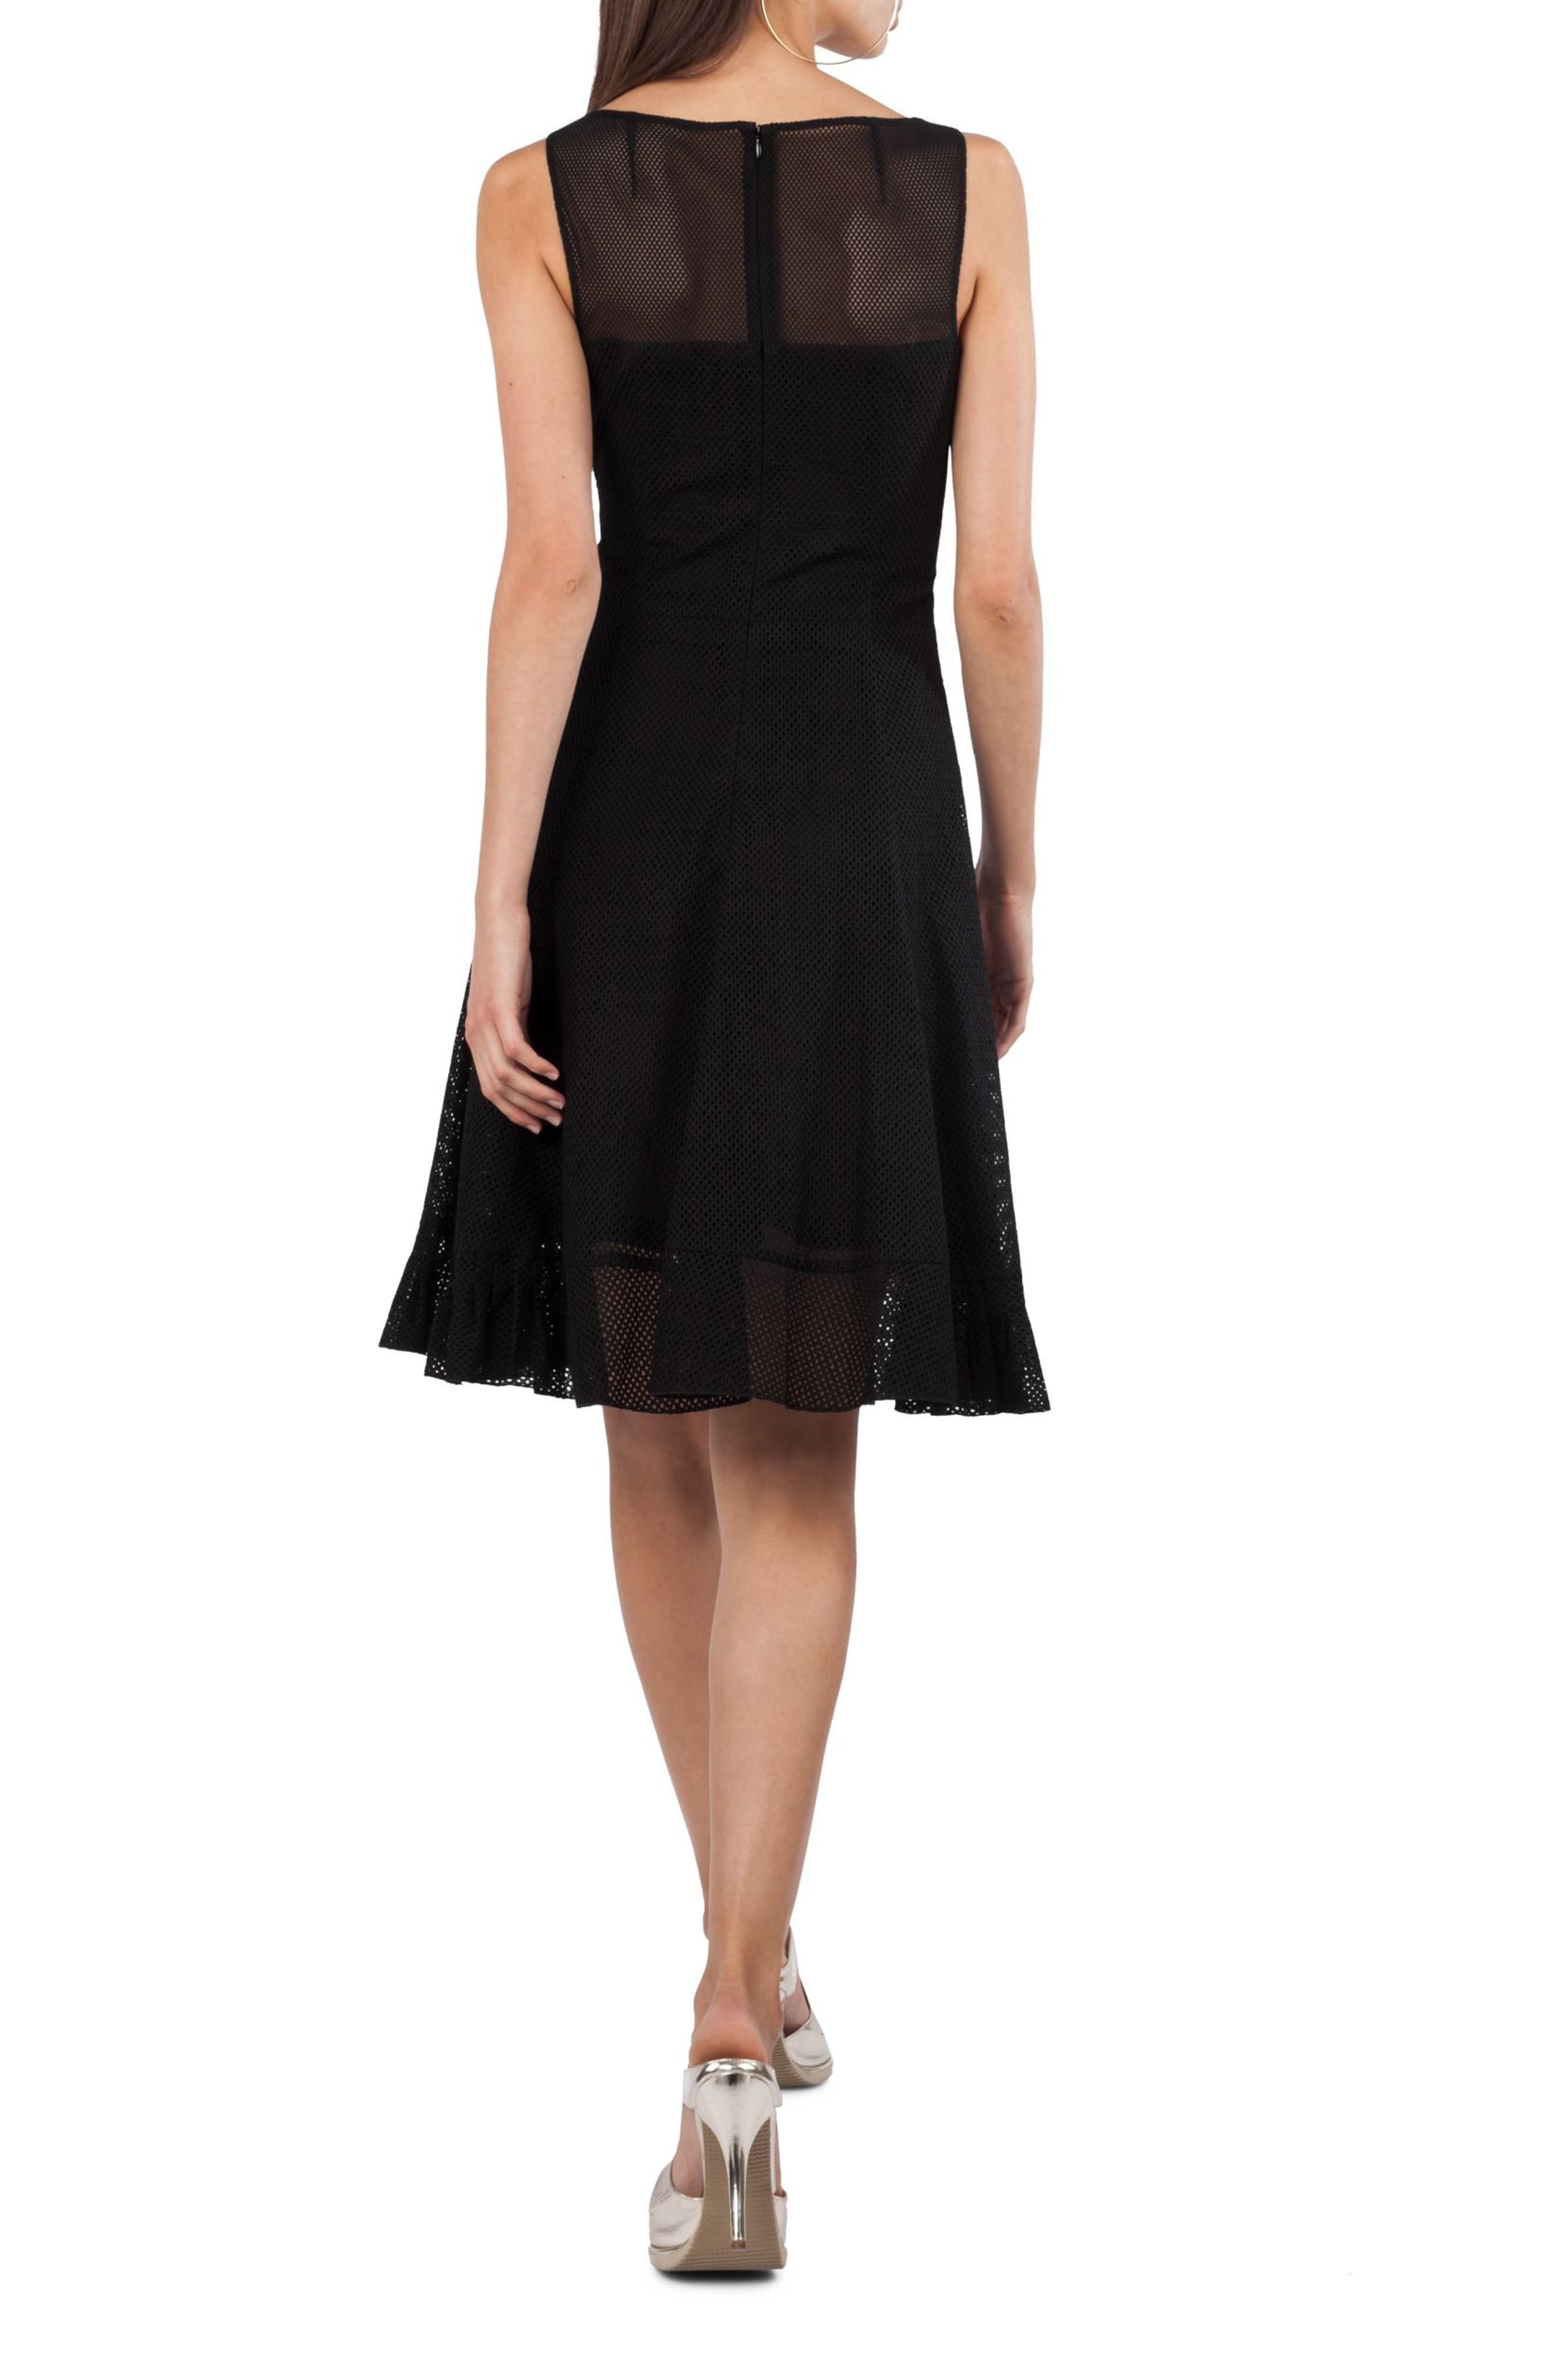 Perforated Tank Dress,                             Alternate thumbnail 2, color,                             Black